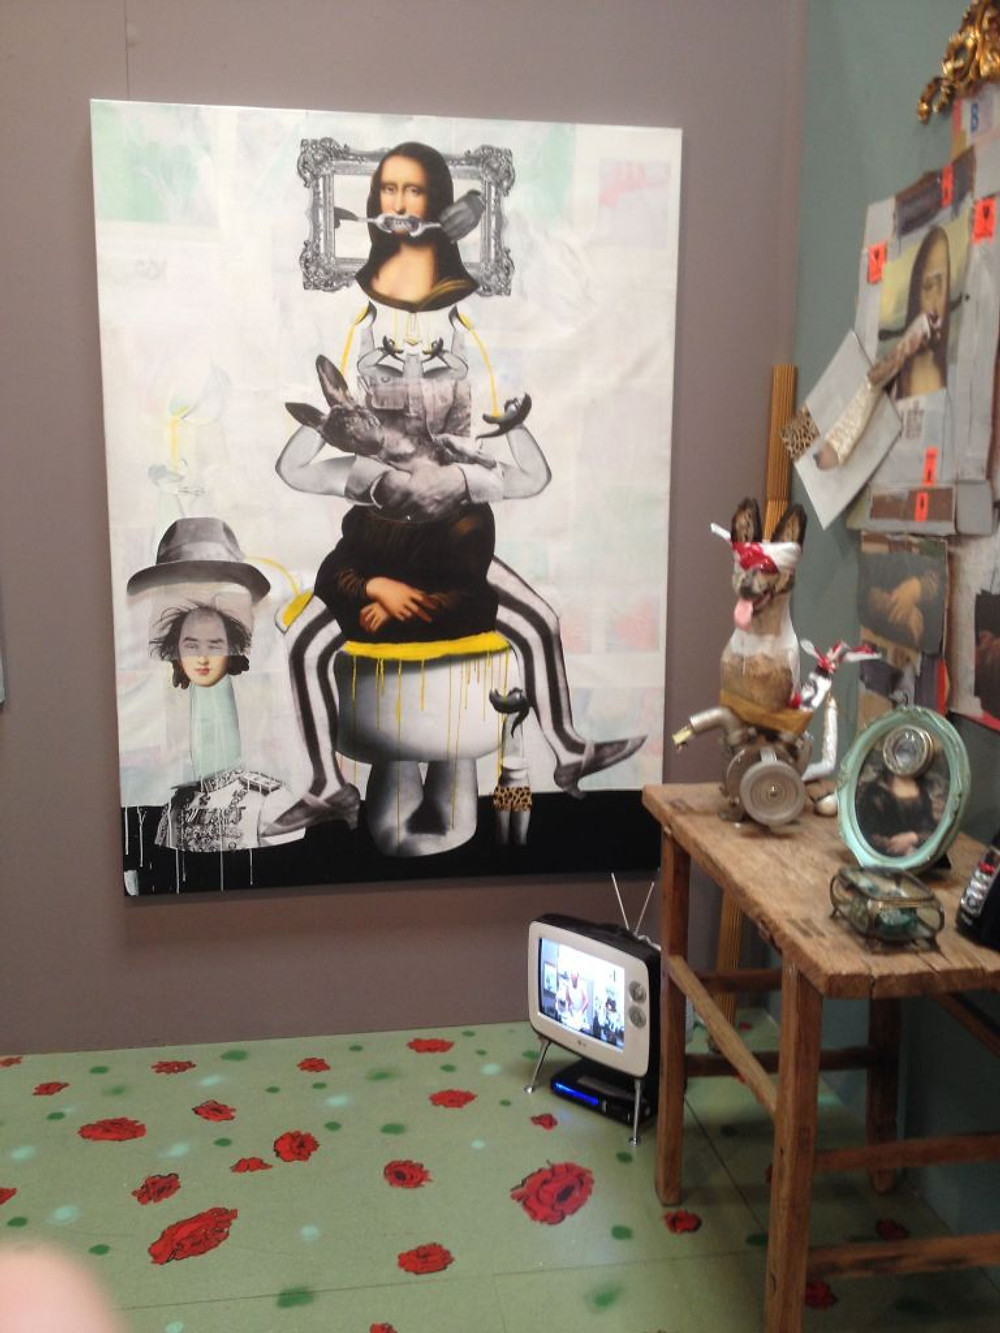 Detail by Ramin Haerizadeh, Rokni Haerizadeh and Hesam Rahmanian at Gallery Isabelle Van Den Eynde